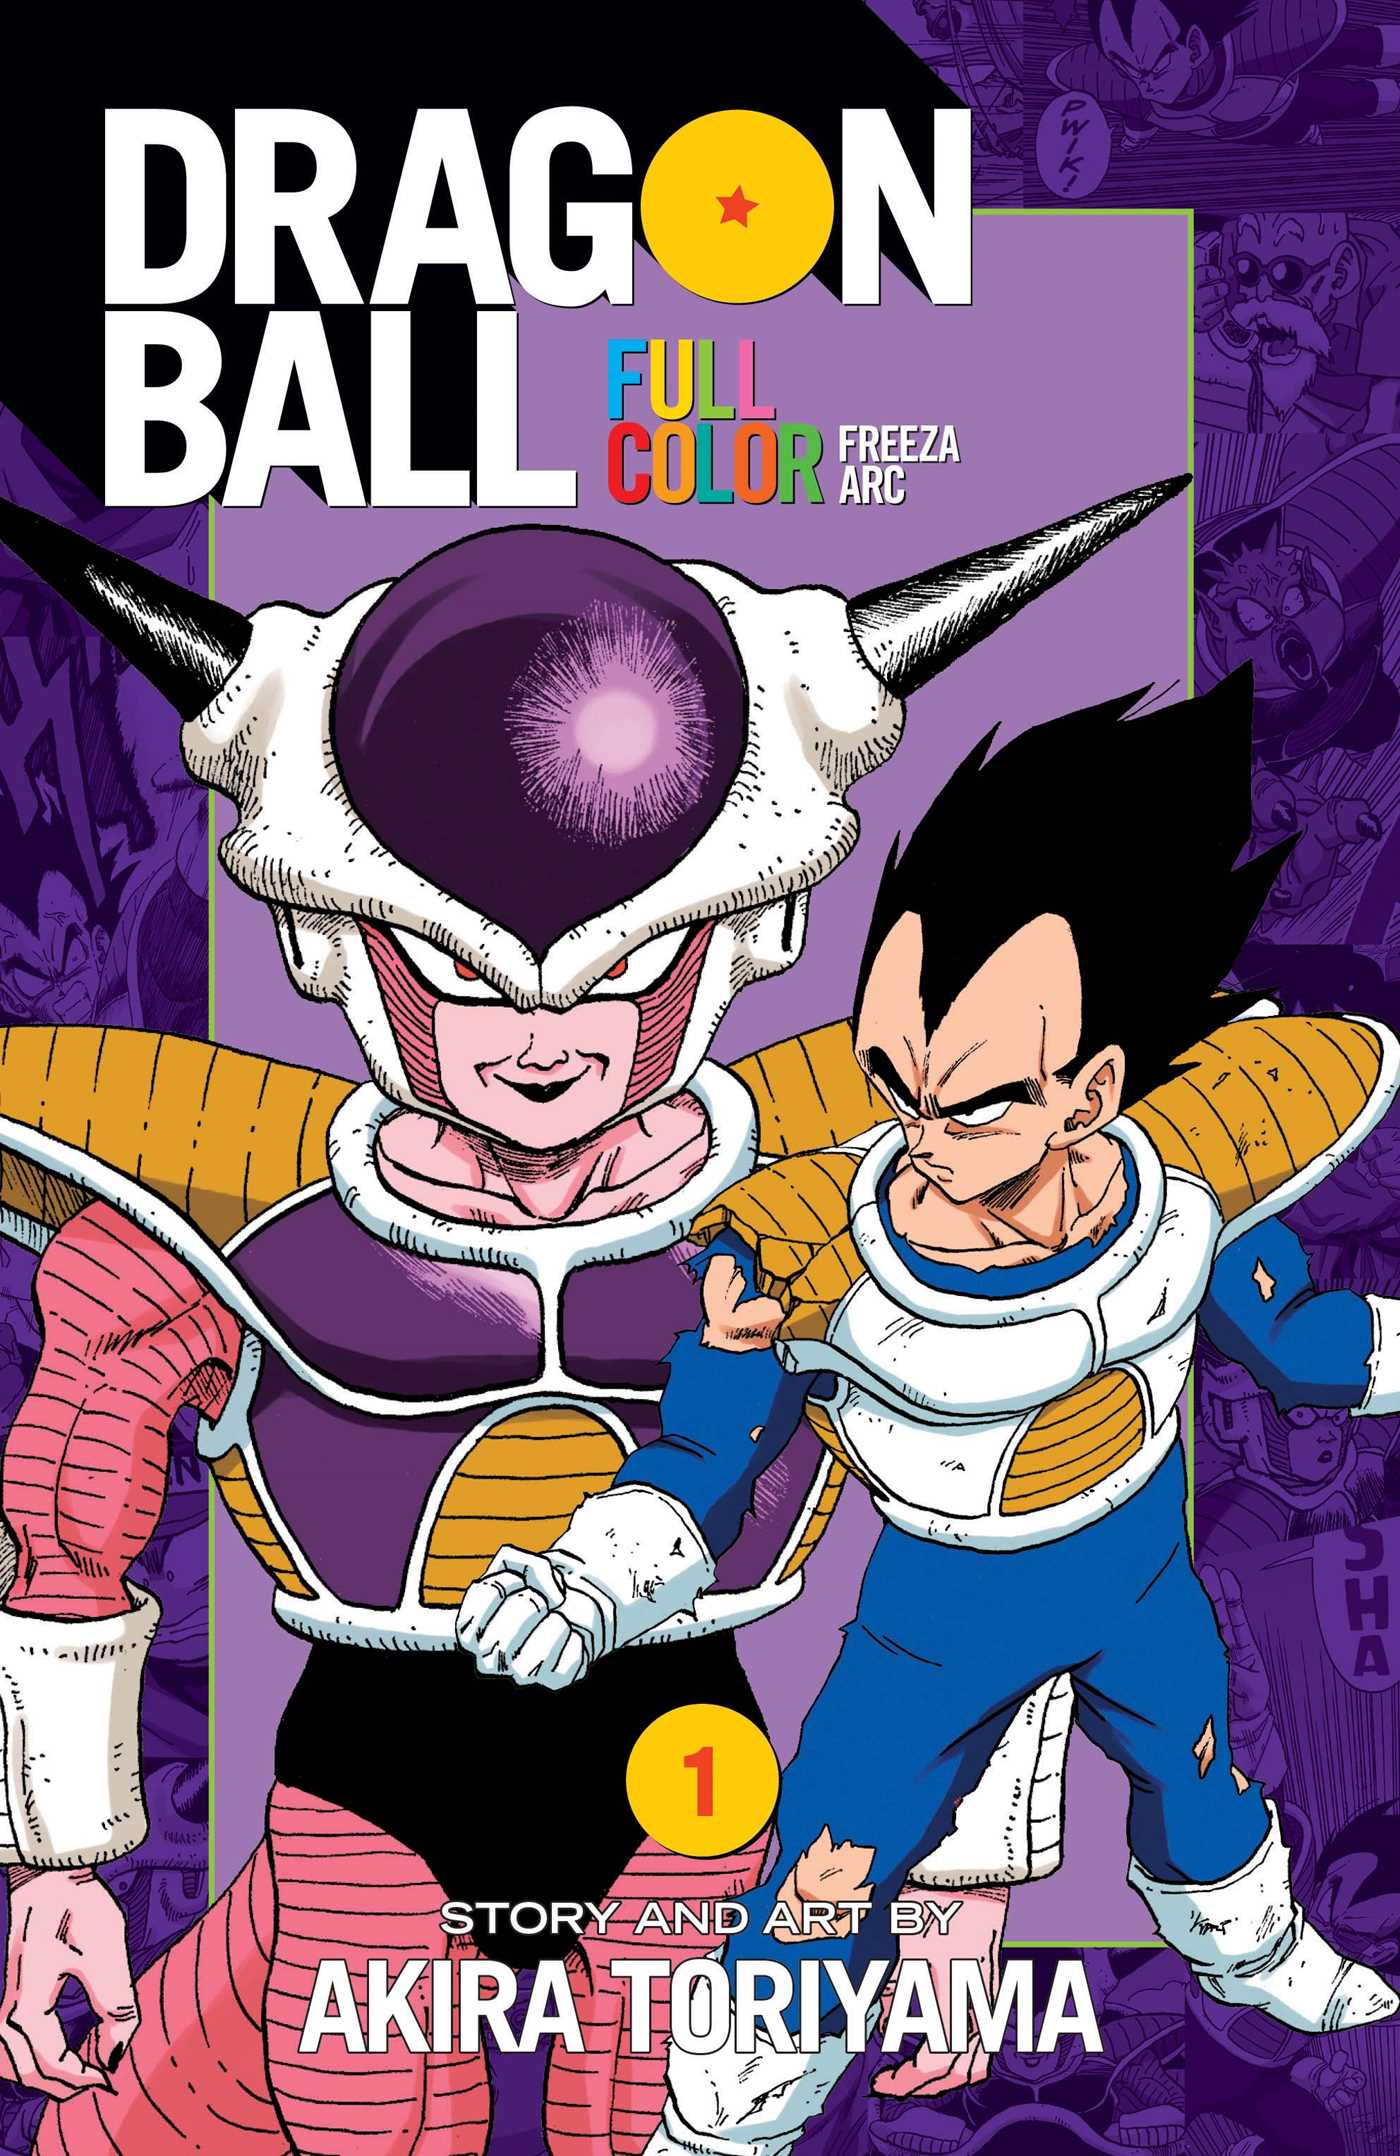 Dragon Ball Full Color Freeza Arc Vol 1 Book By Akira